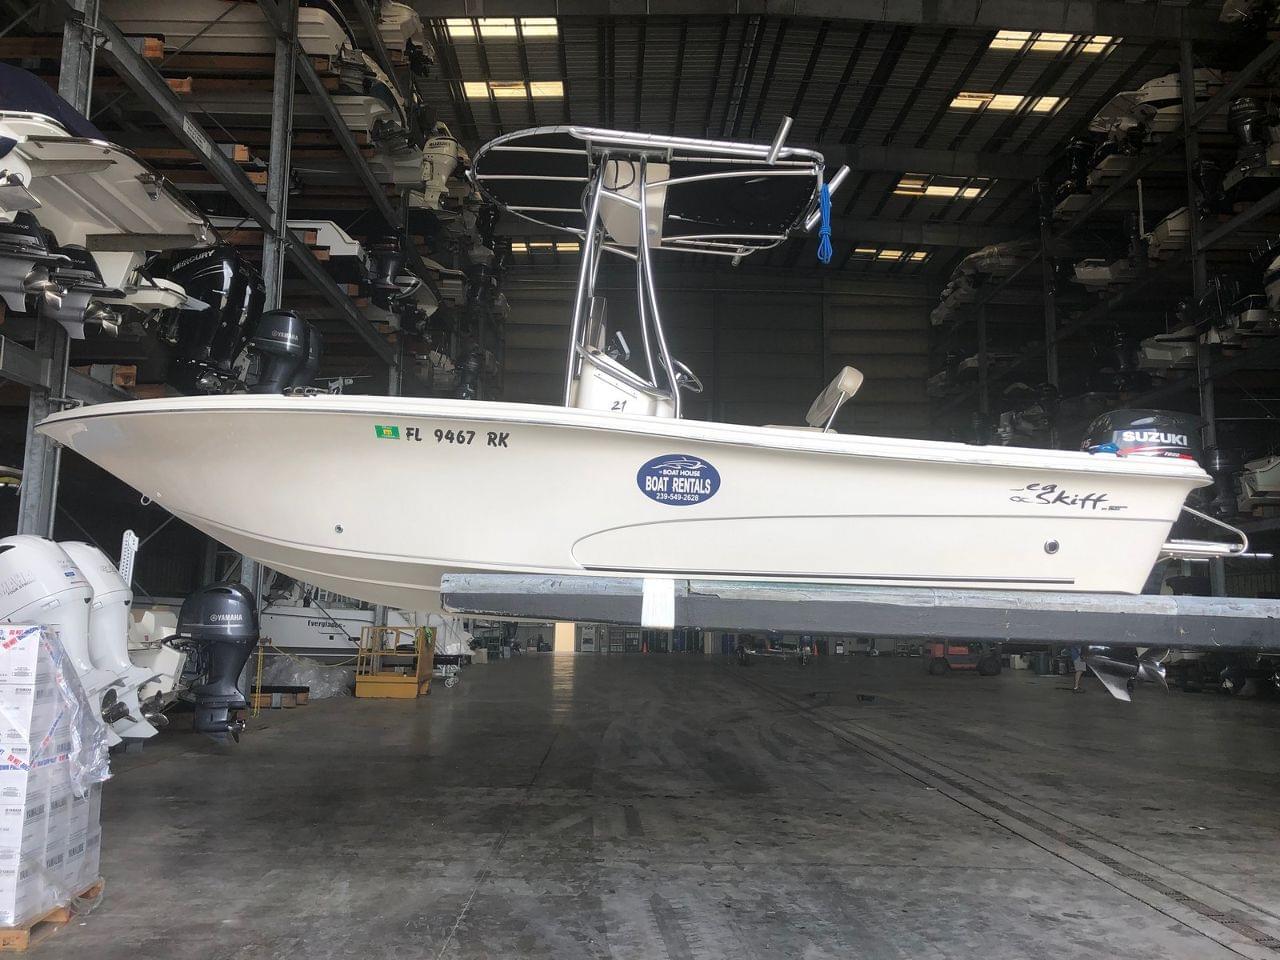 Used 2017 Sea-chaser 21 Sea Skiff, Stock #79831-B1 - The